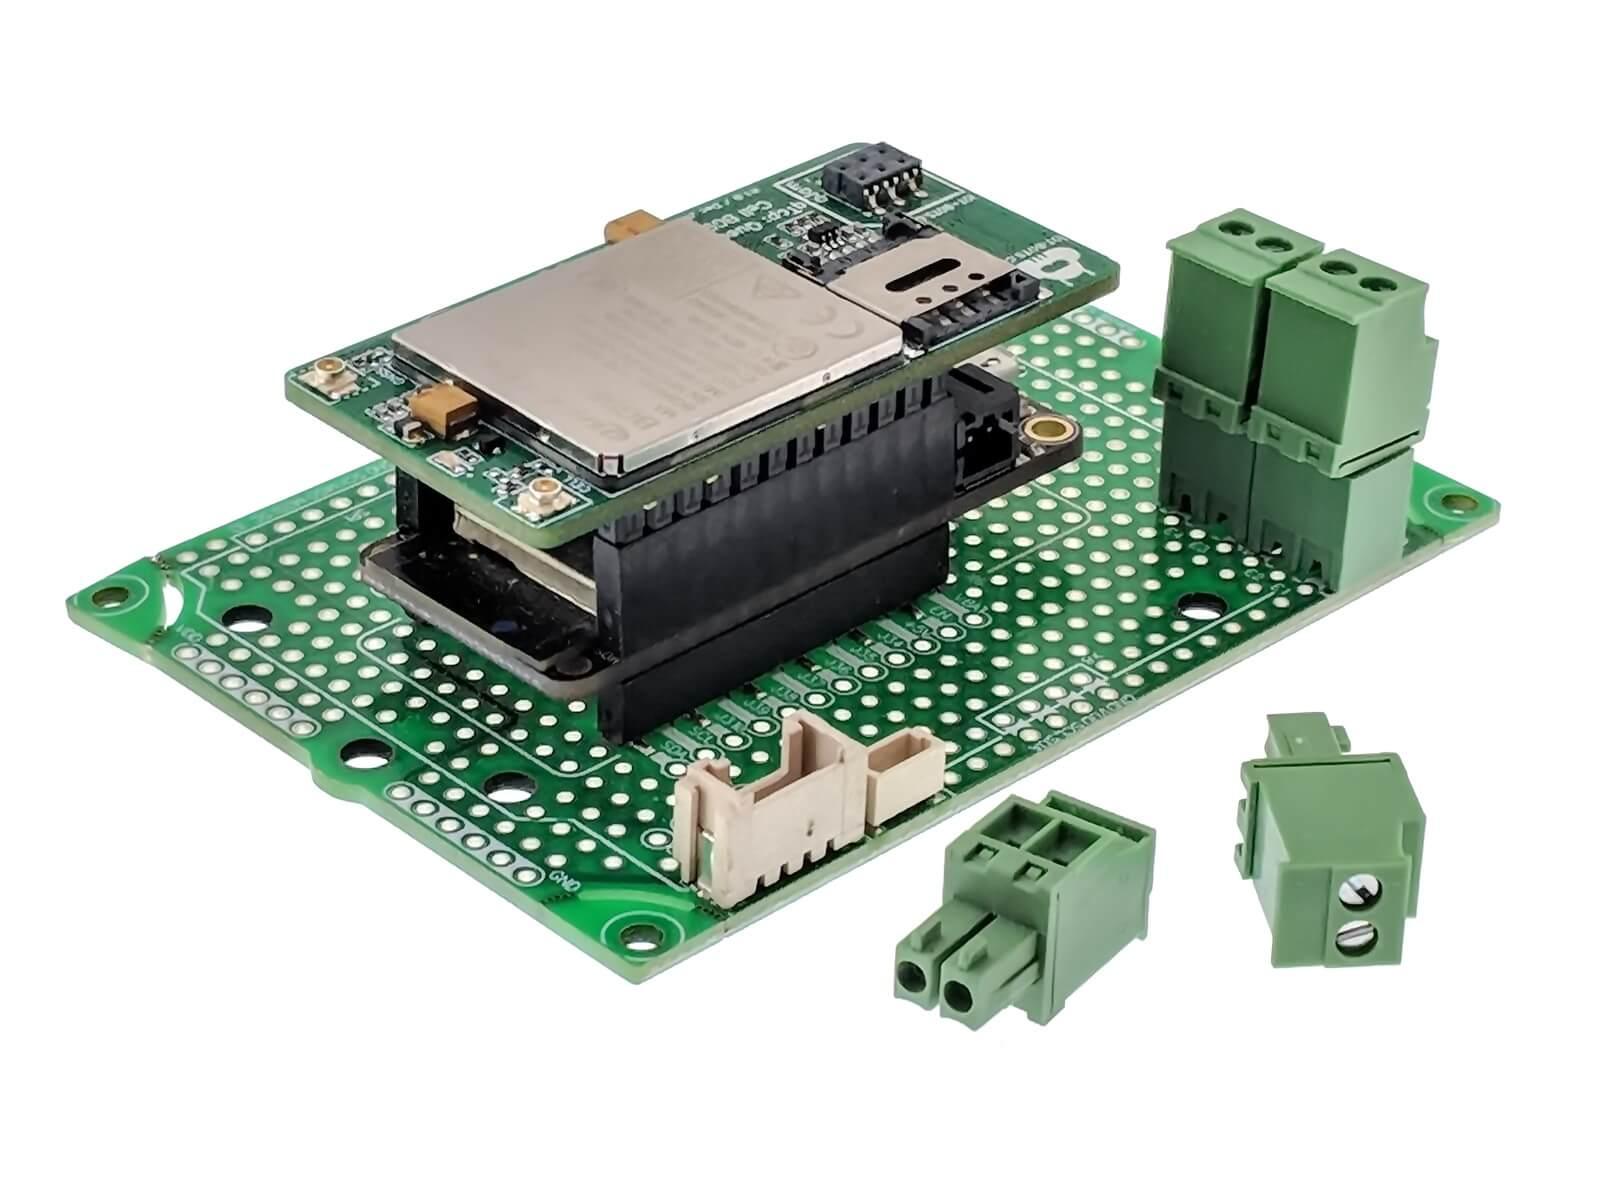 iotbotscom-qtop-cell-quectel-bg96-afc-qground-pcb-kit